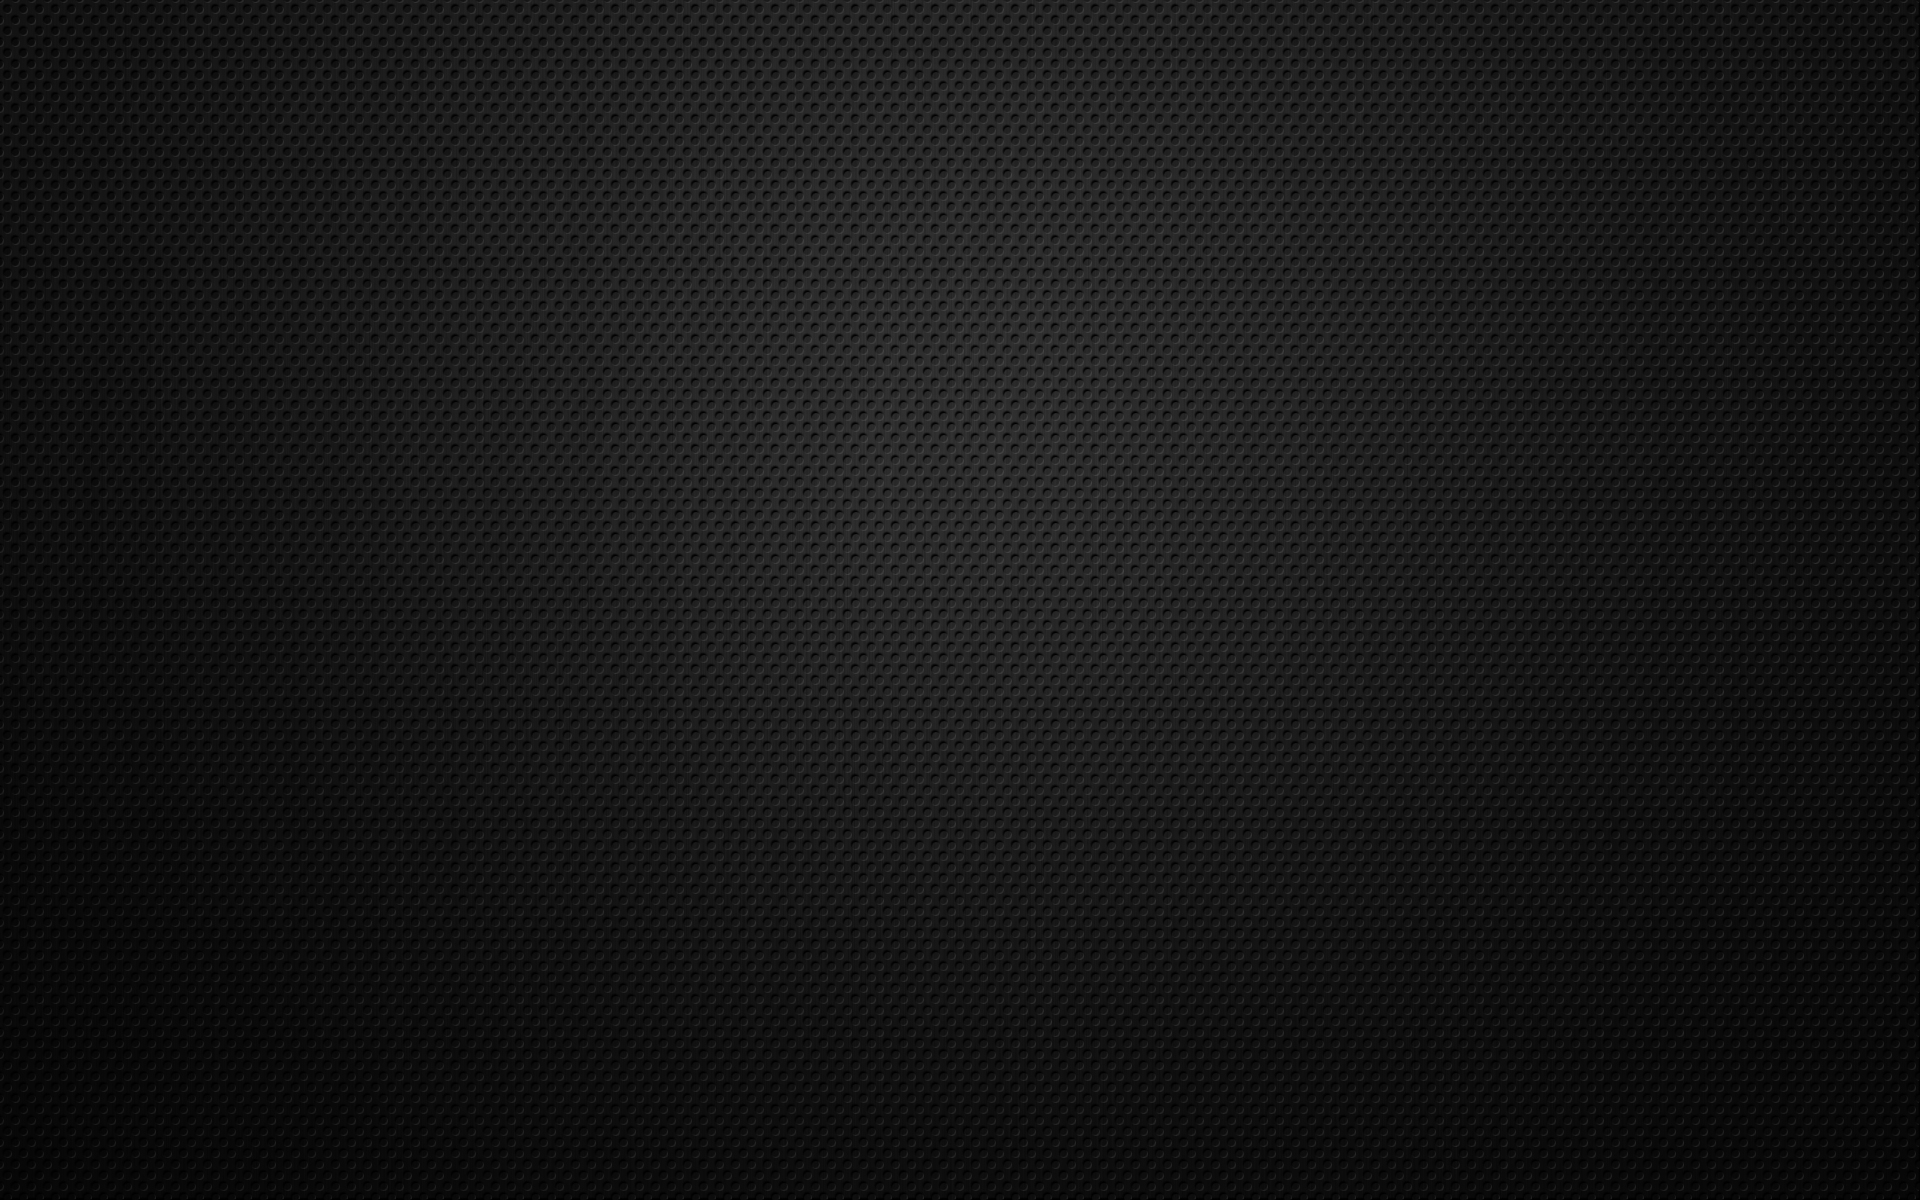 Black Background Hole 2 - 2560x1600 by Freeman